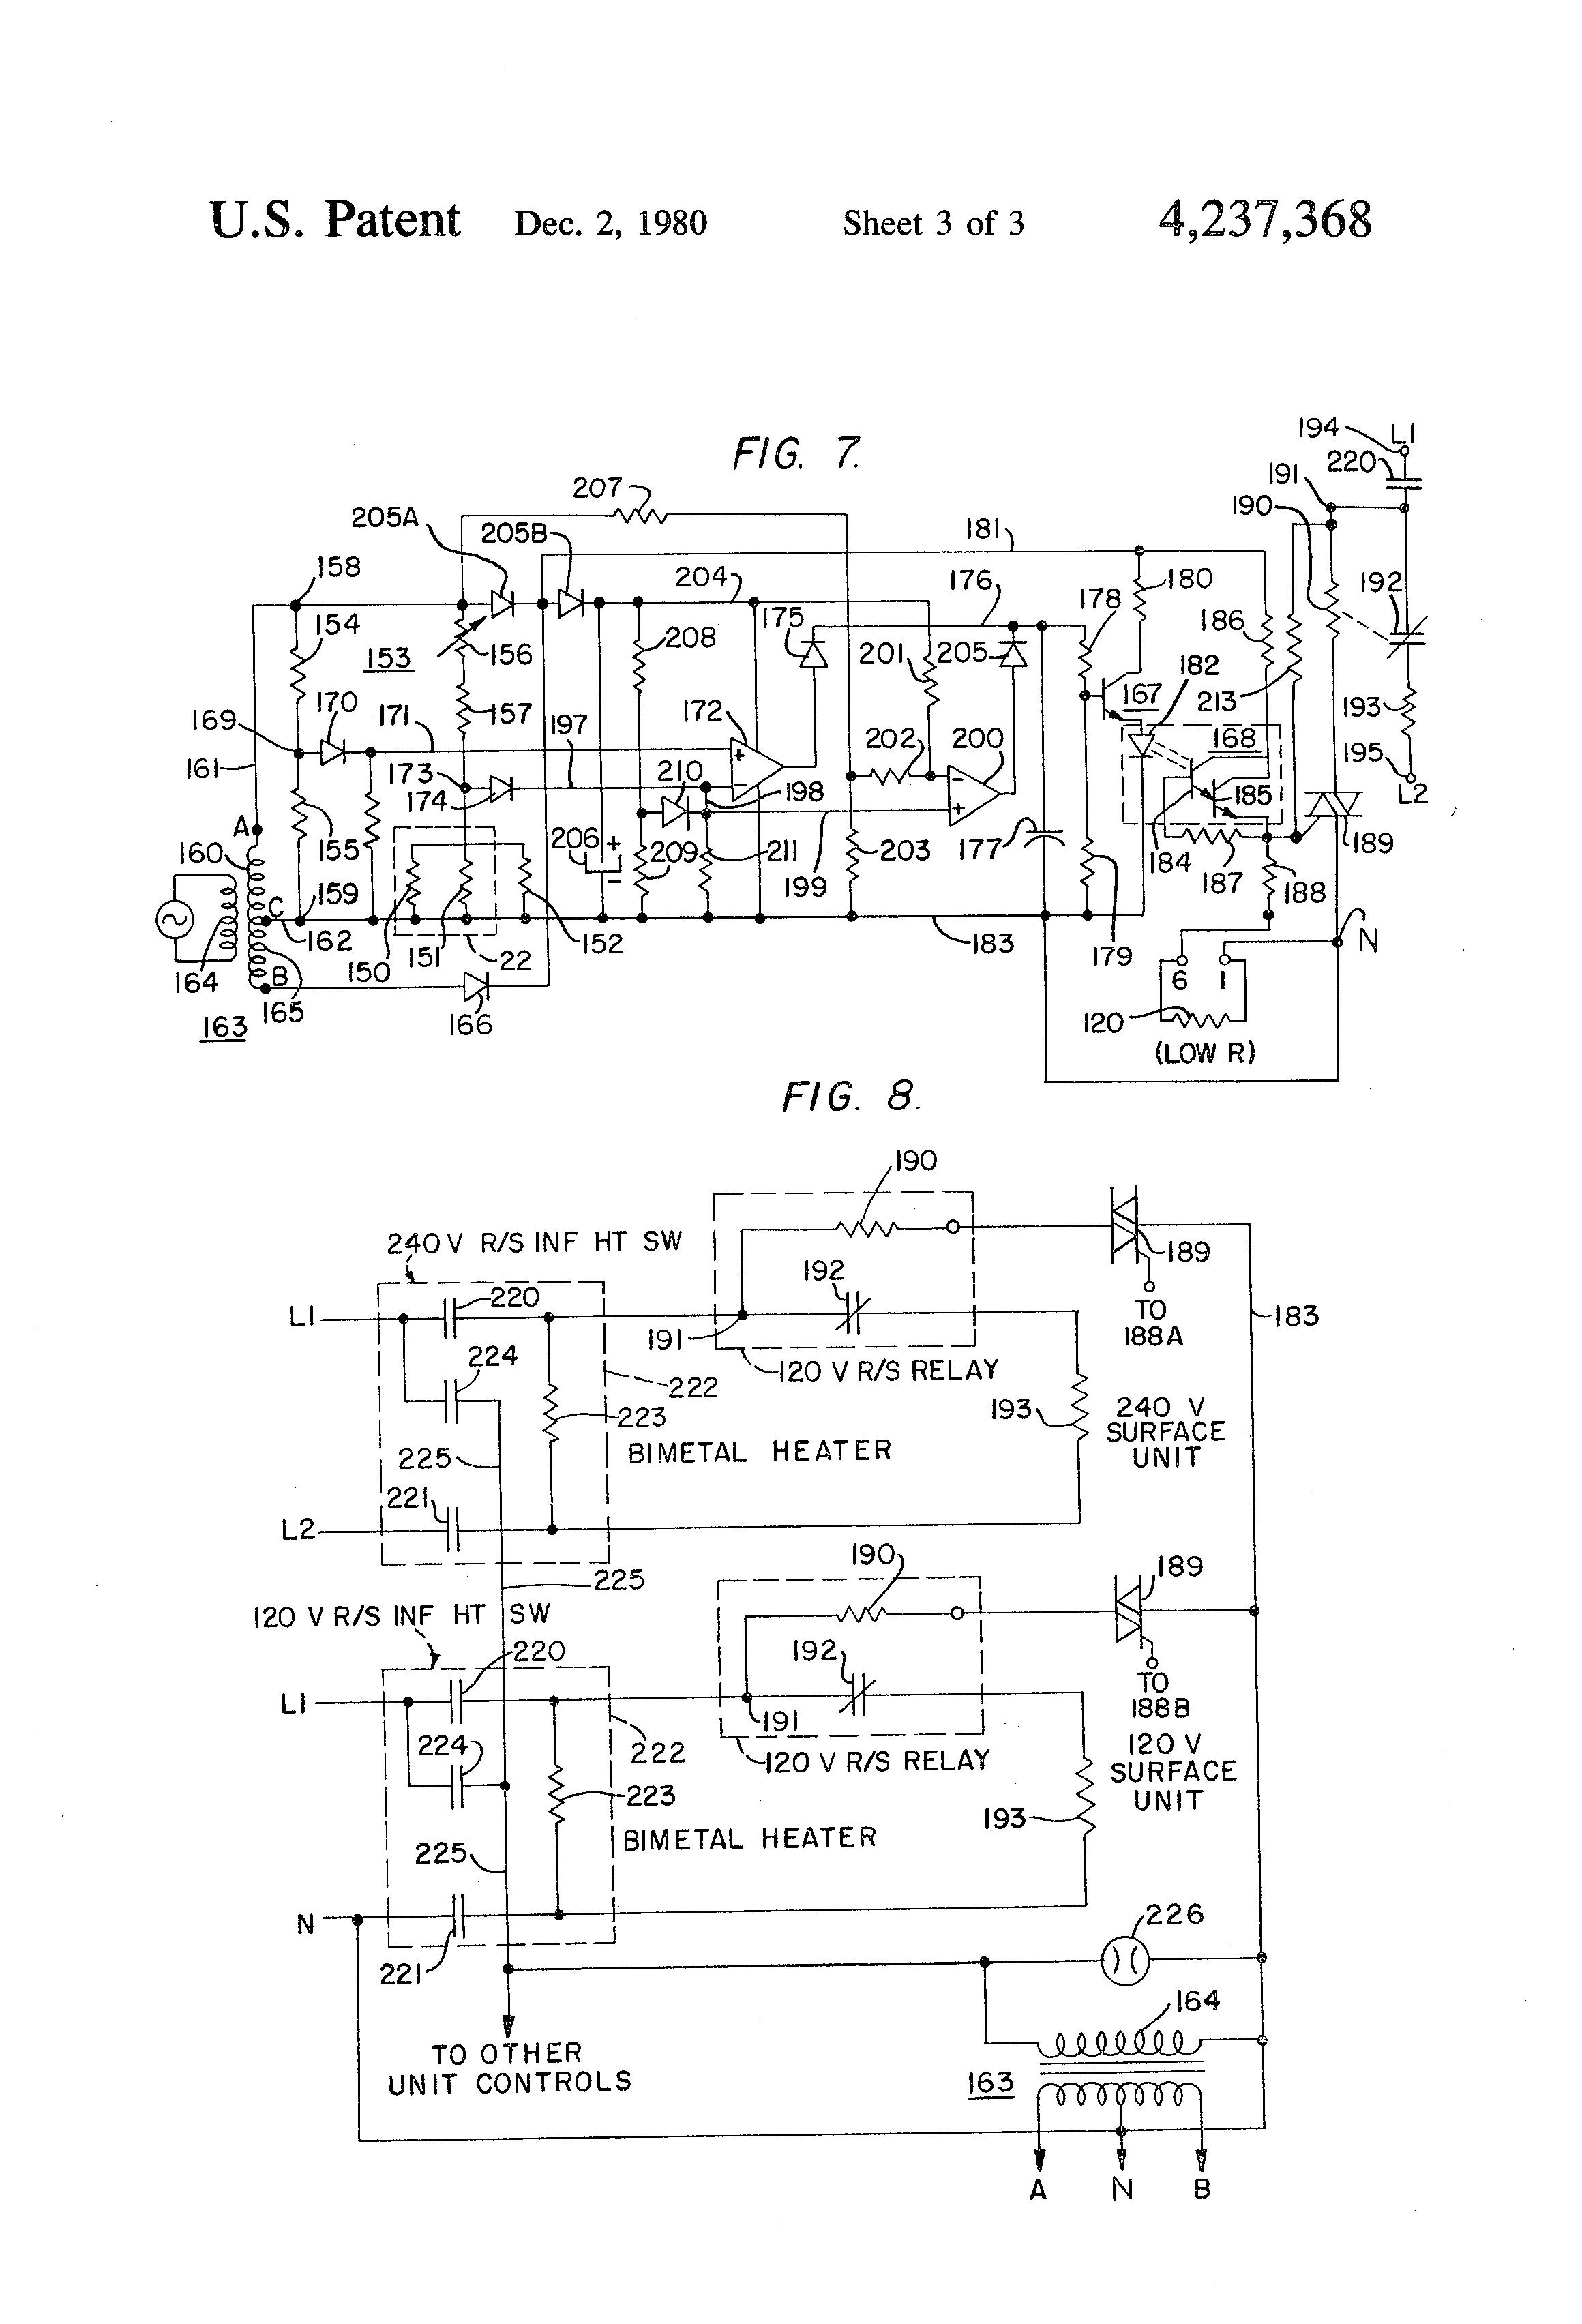 Hatco Wiring Diagram | Wiring Diagram on